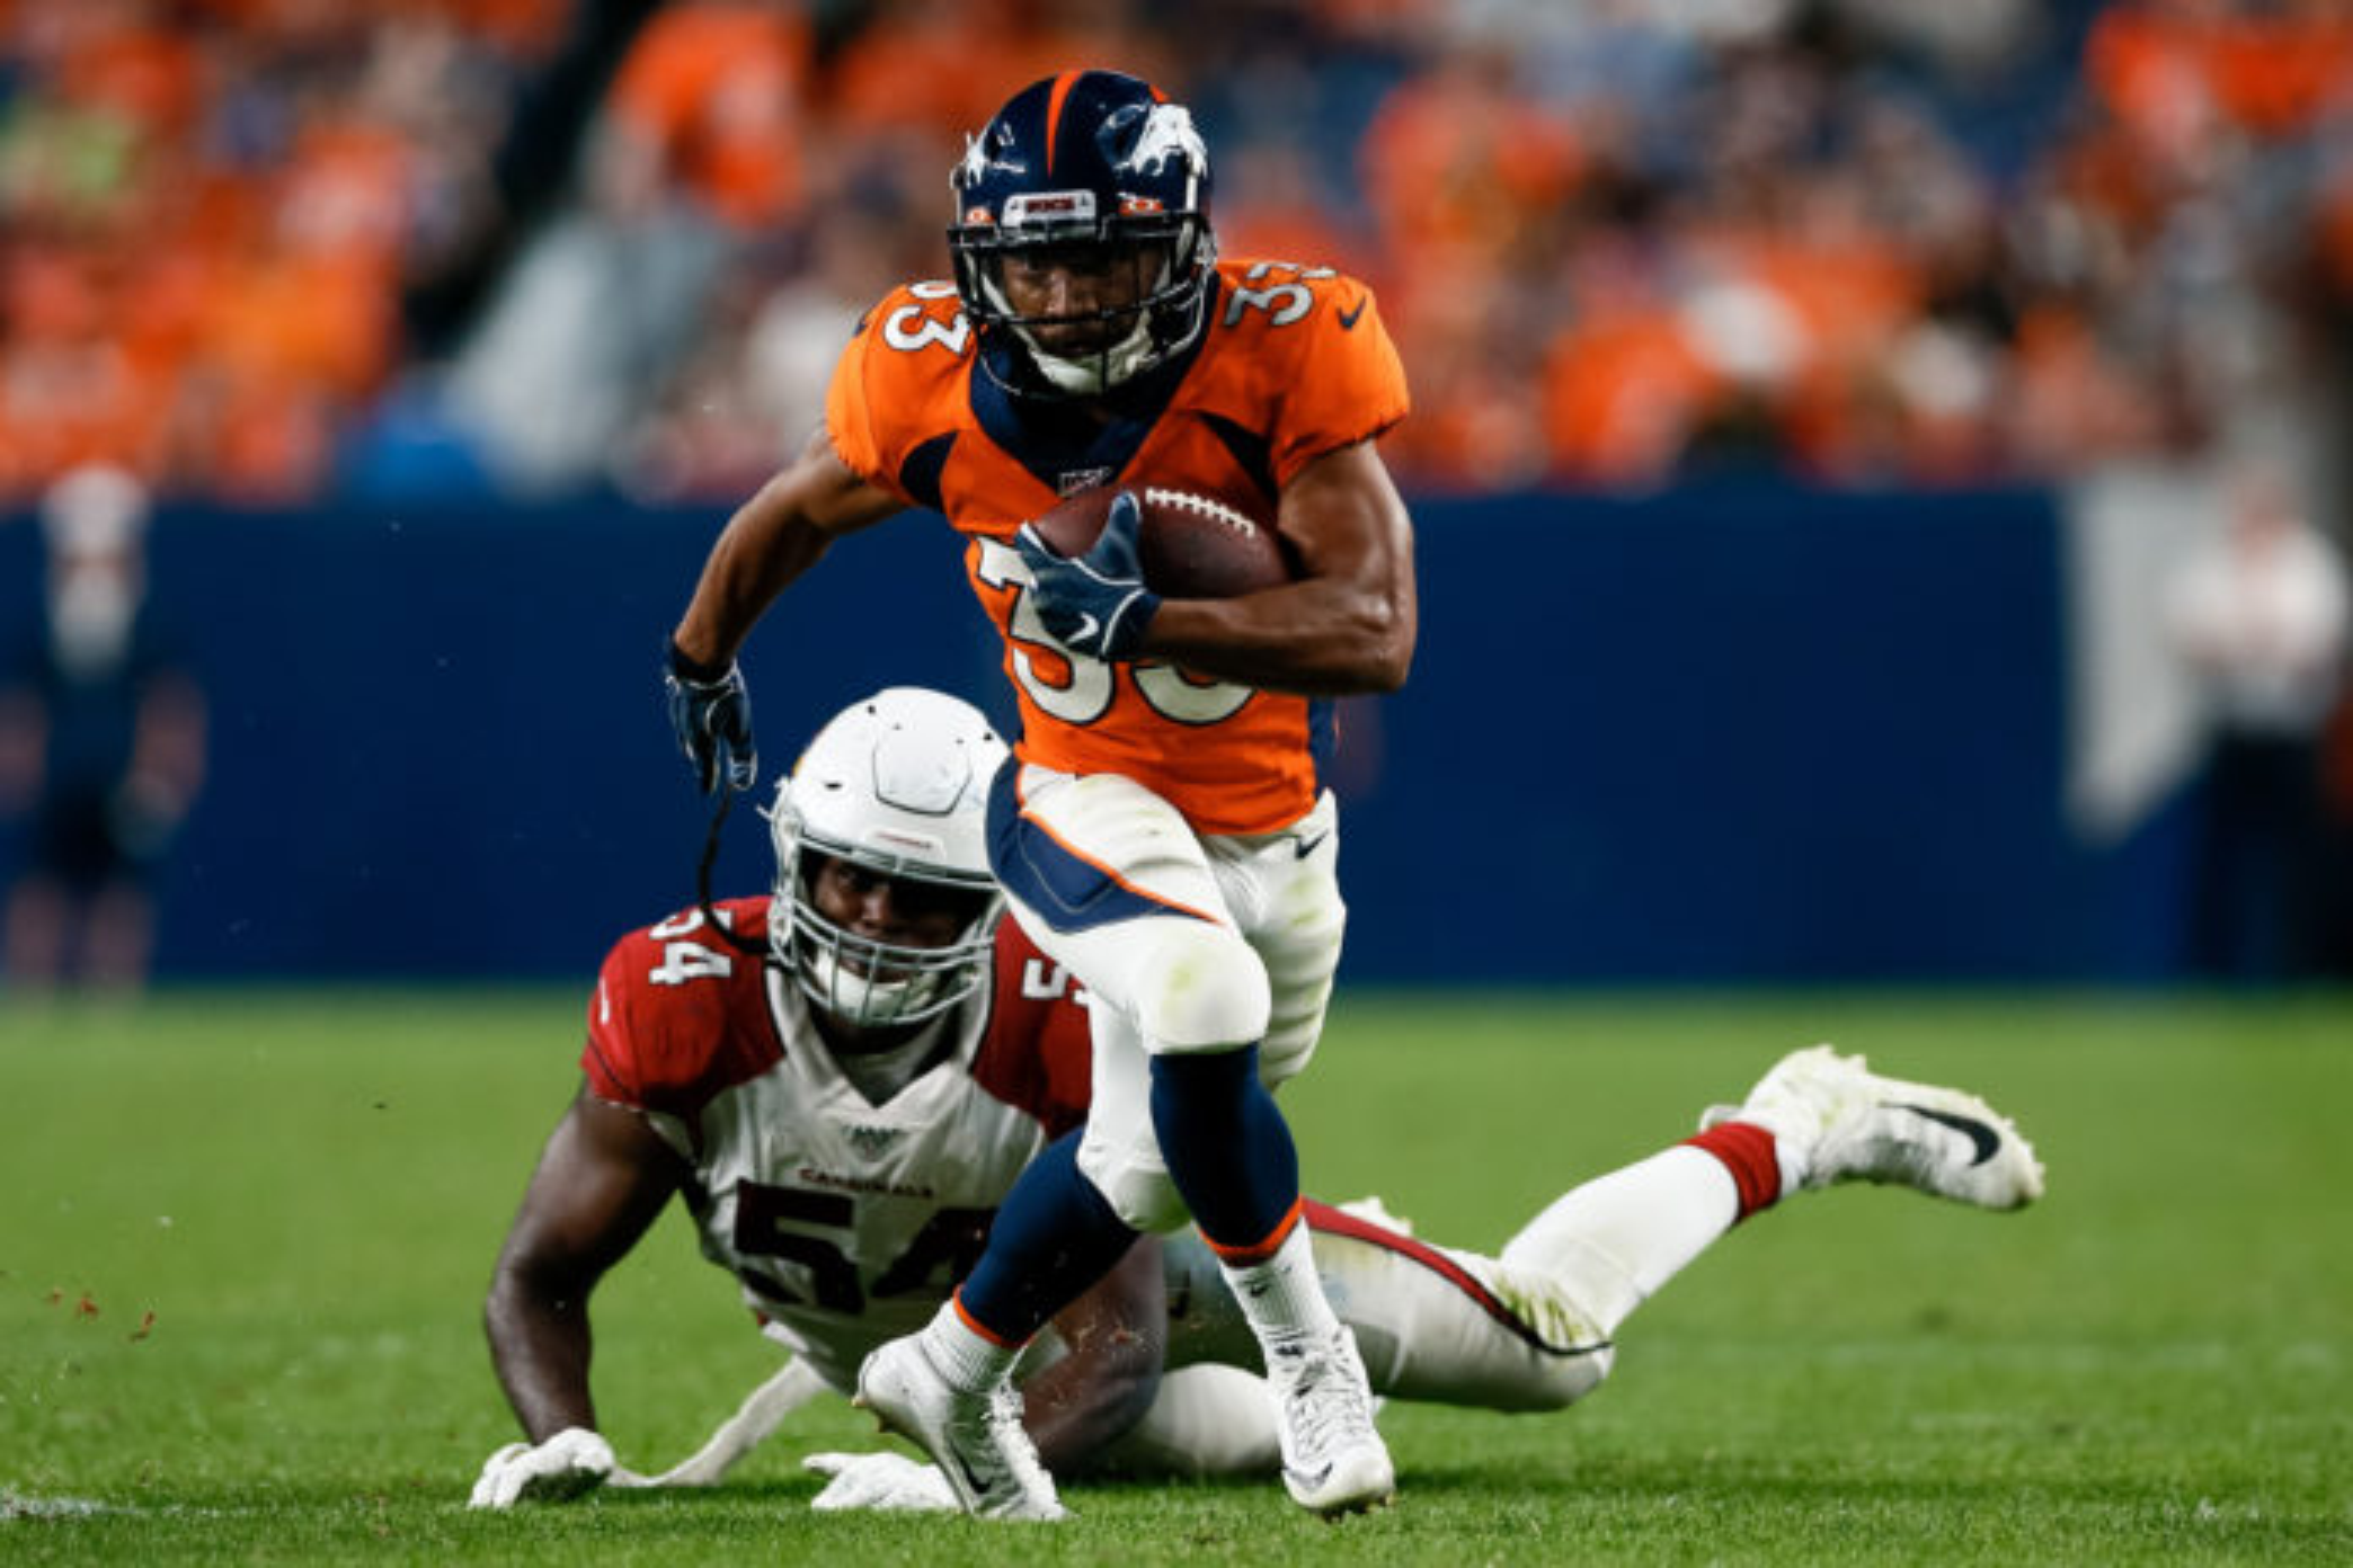 Denver Broncos running back Khalfani Muhammad (33) runs through the tackle of Arizona Cardinals linebacker Vontarrius Dora (54) in the fourth quarter at Broncos Stadium at Mile High.